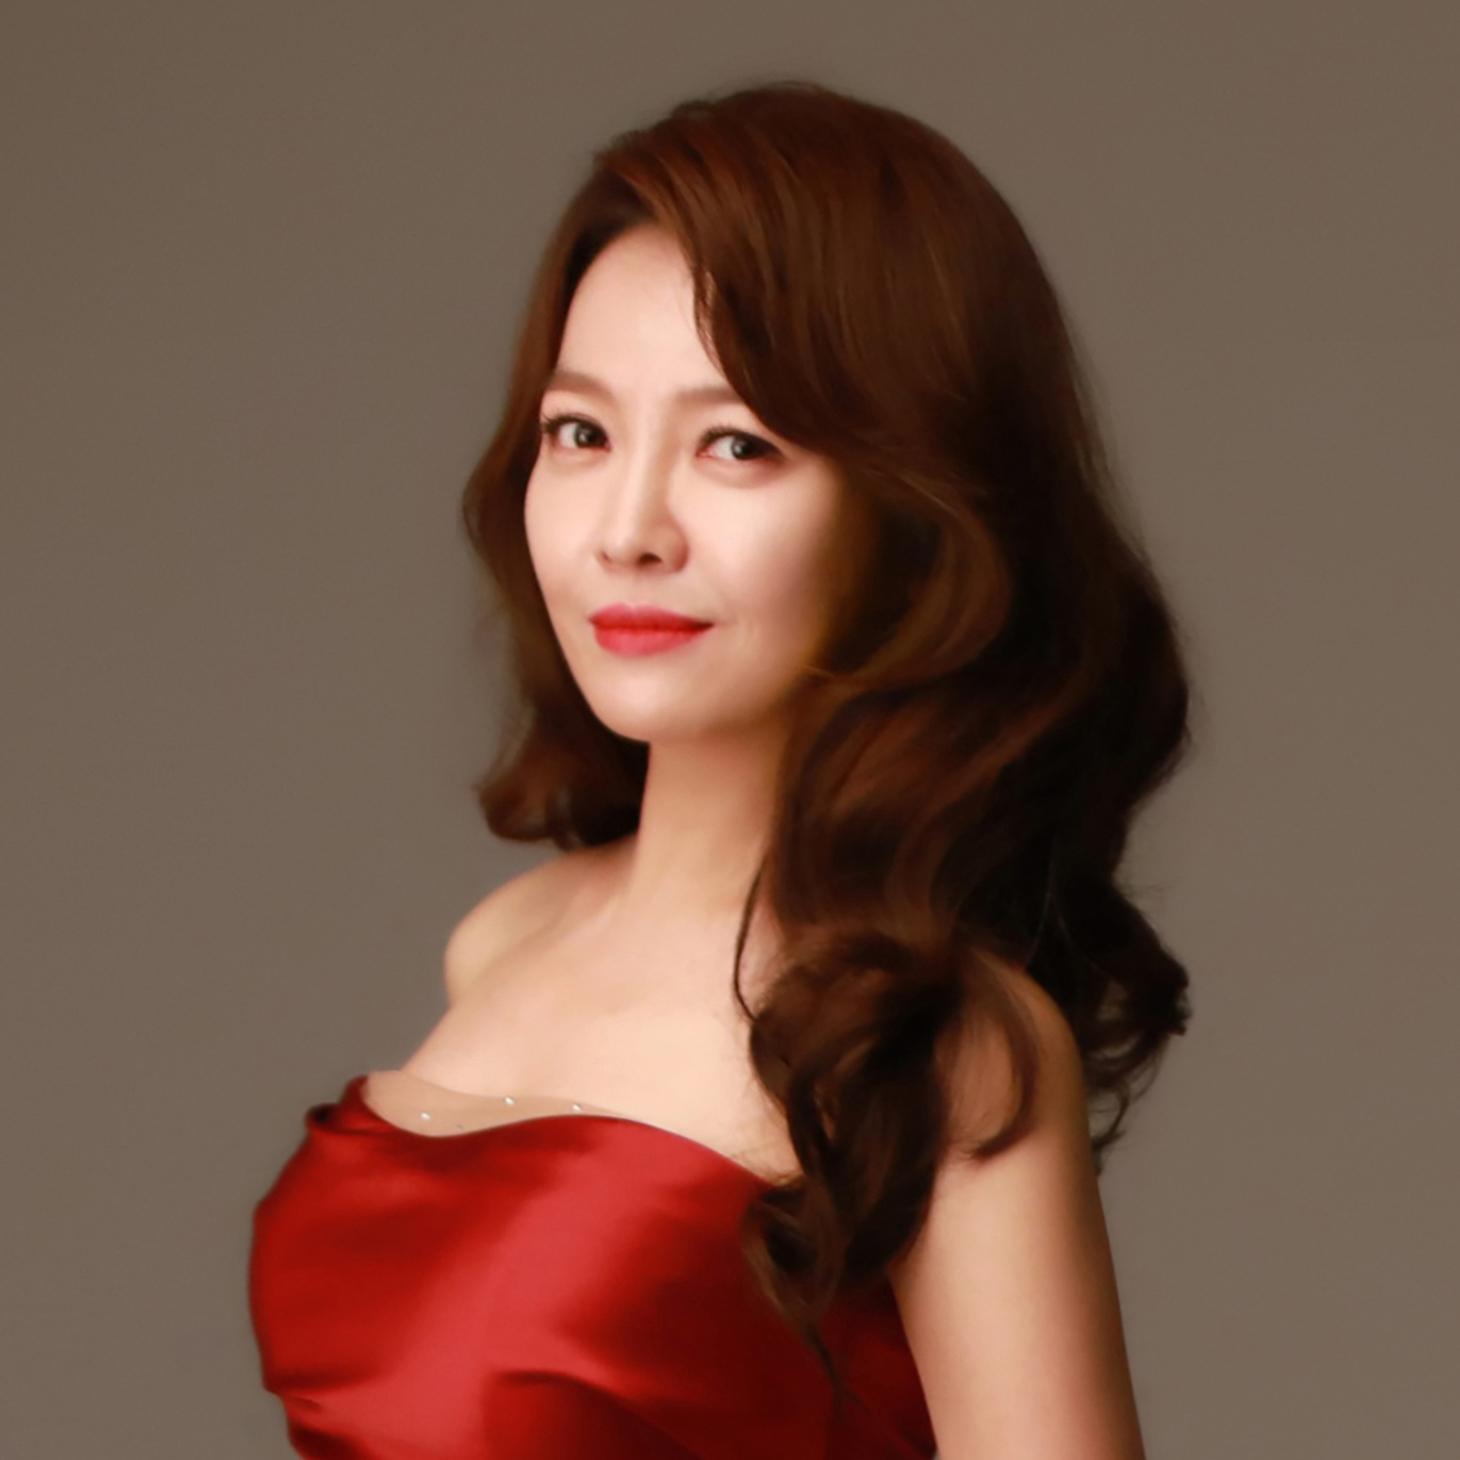 Sunhae Im - Wikipedia